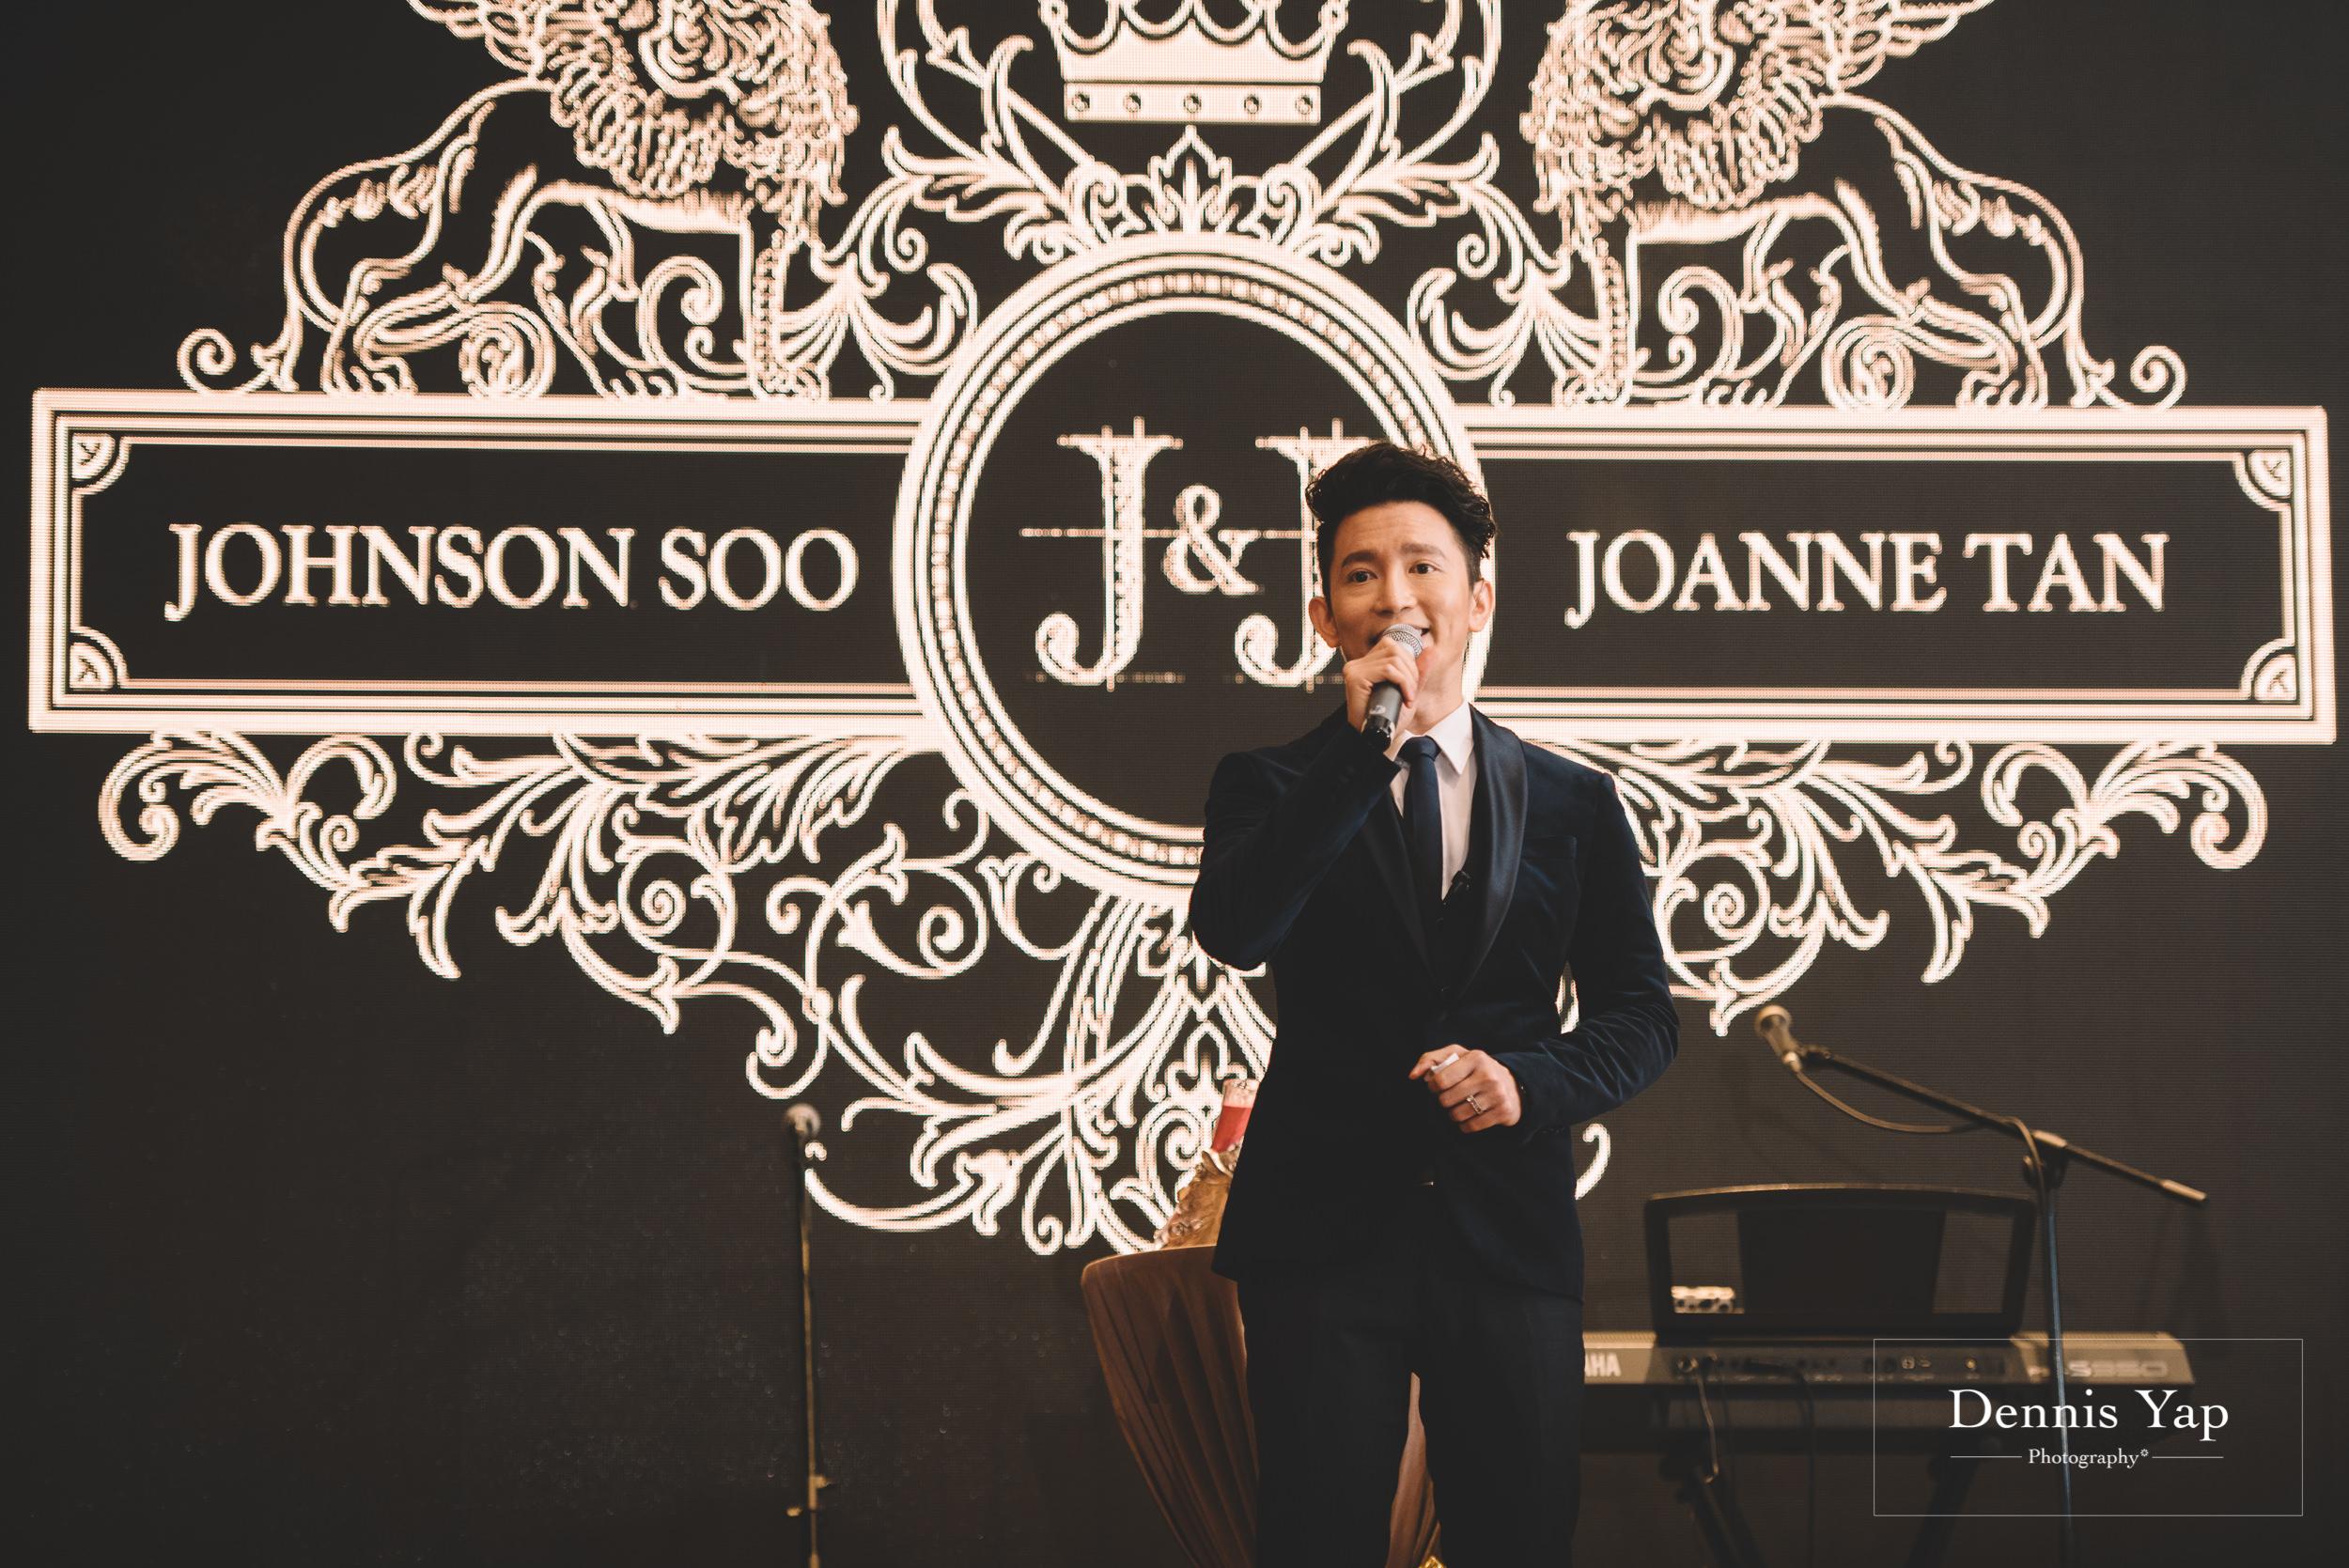 johnson joanne wedding dinner klang centro malaysia wedding photographer dennis yap-4.jpg